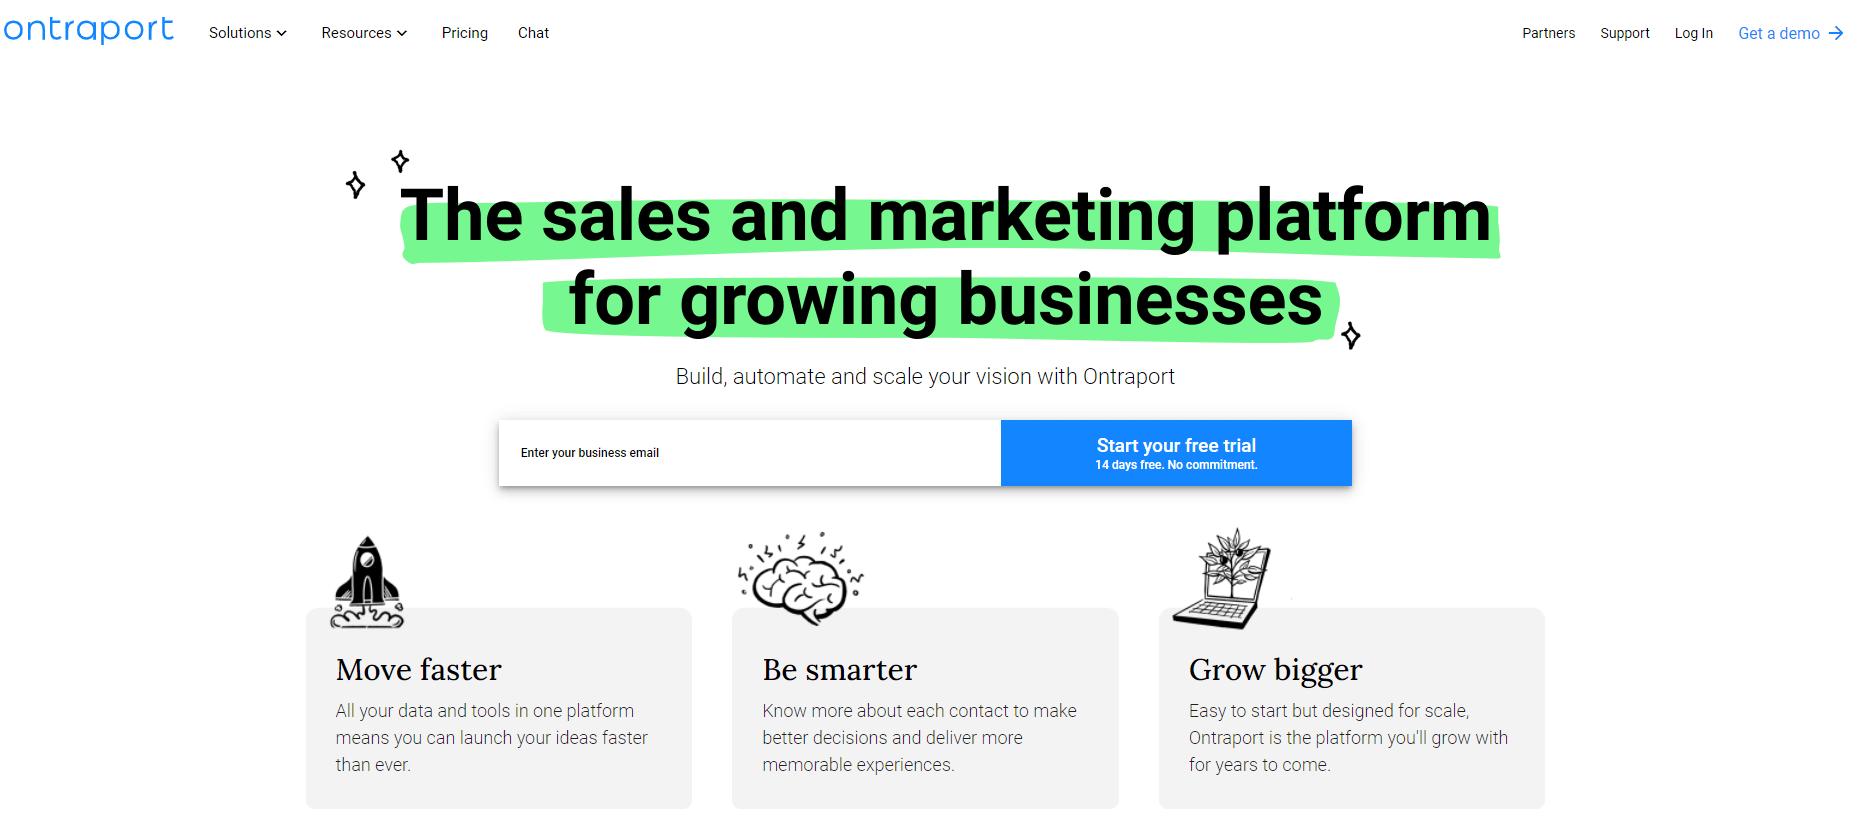 ontraport-best-saas-startups-2021